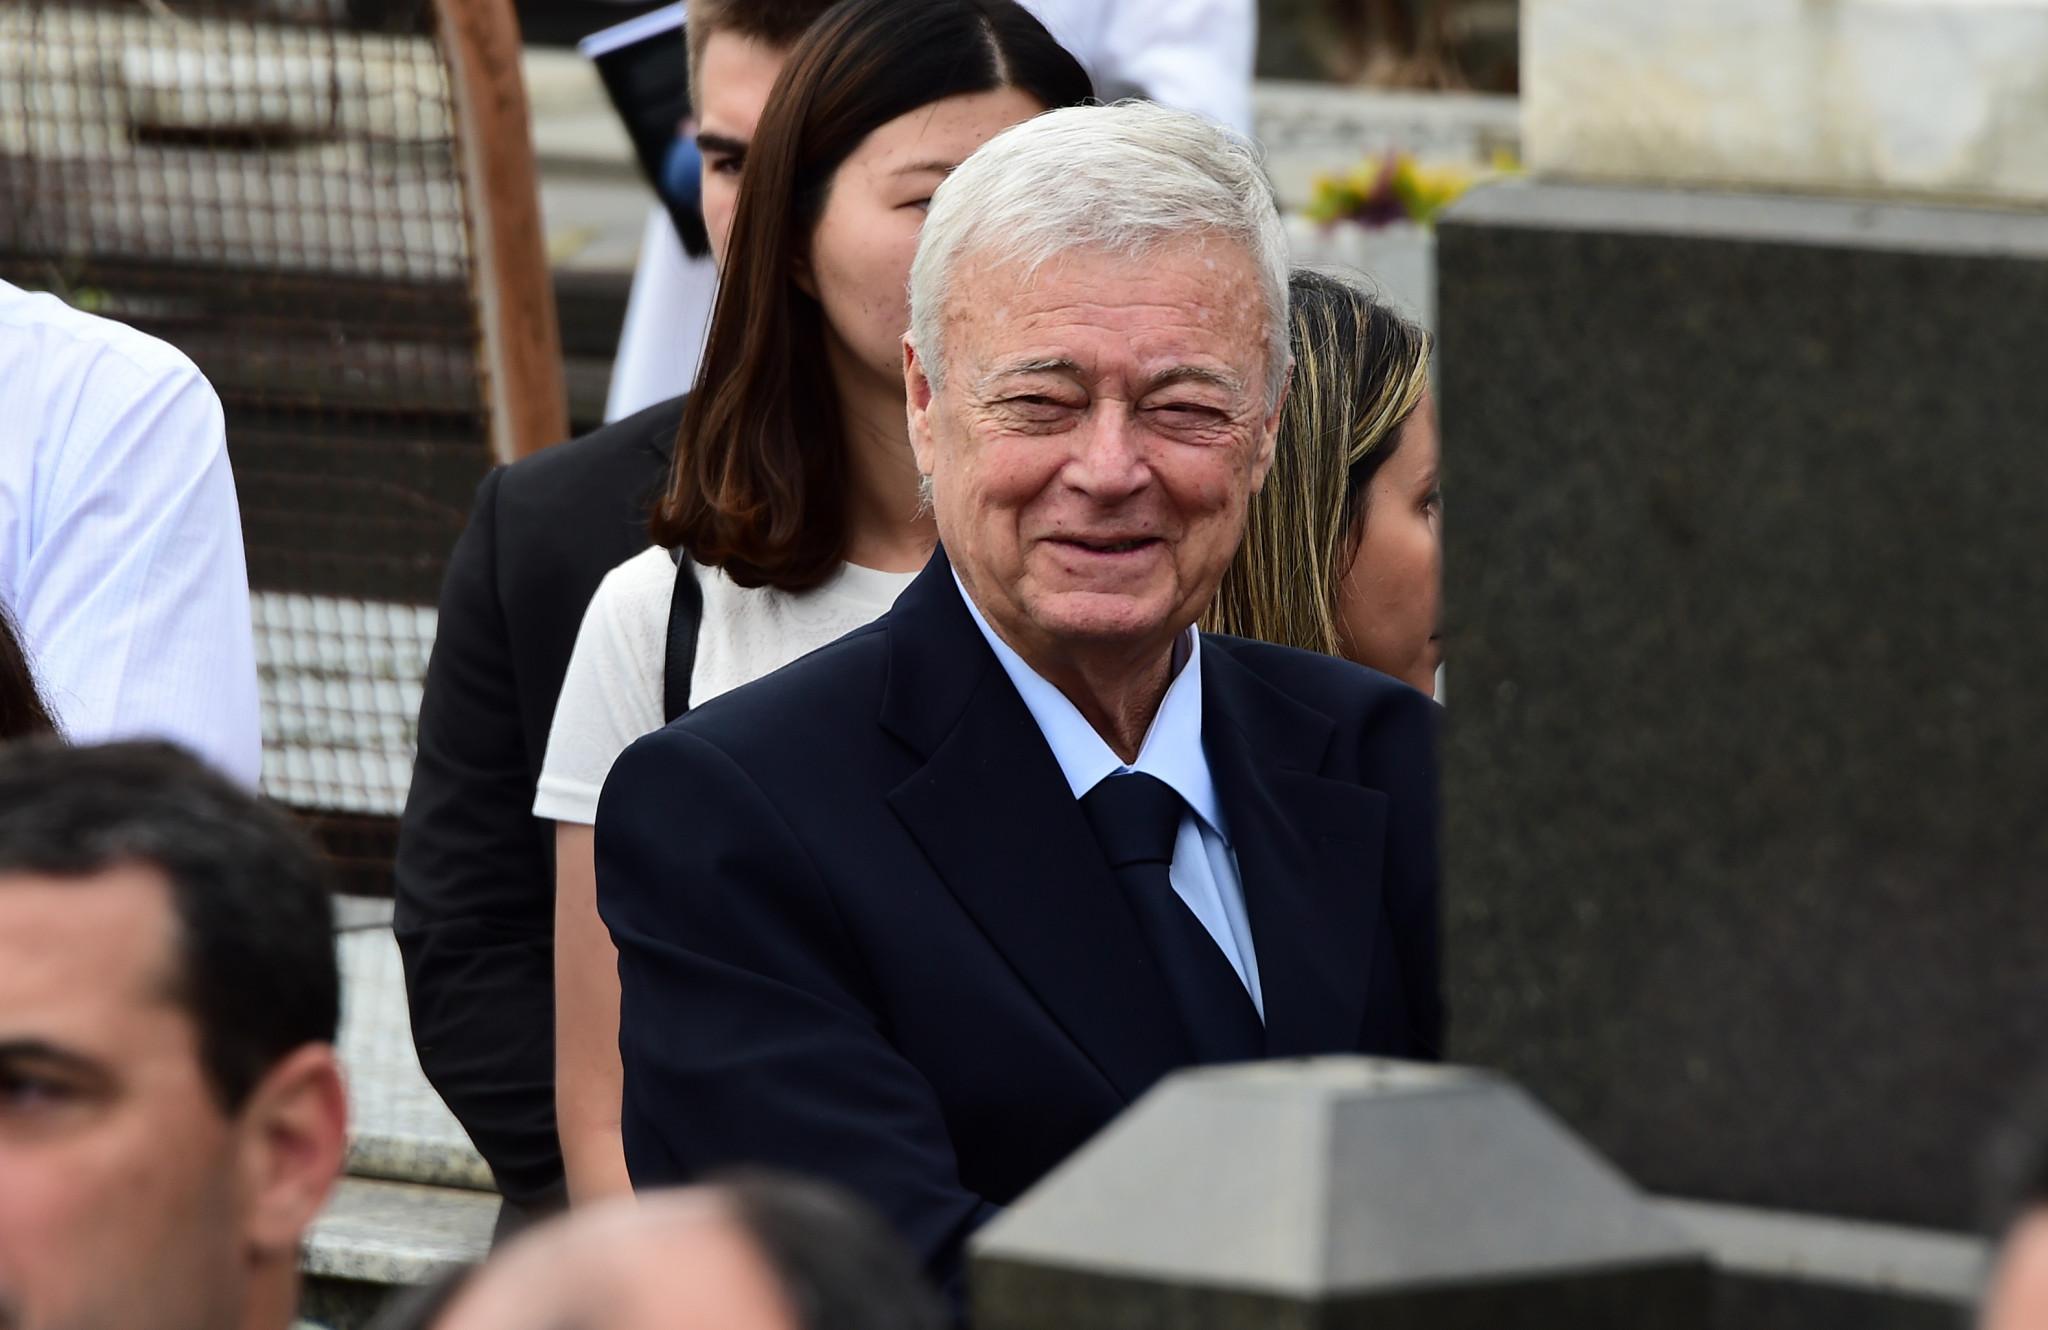 CAS to hear Teixeira appeal against FIFA life ban tomorrow